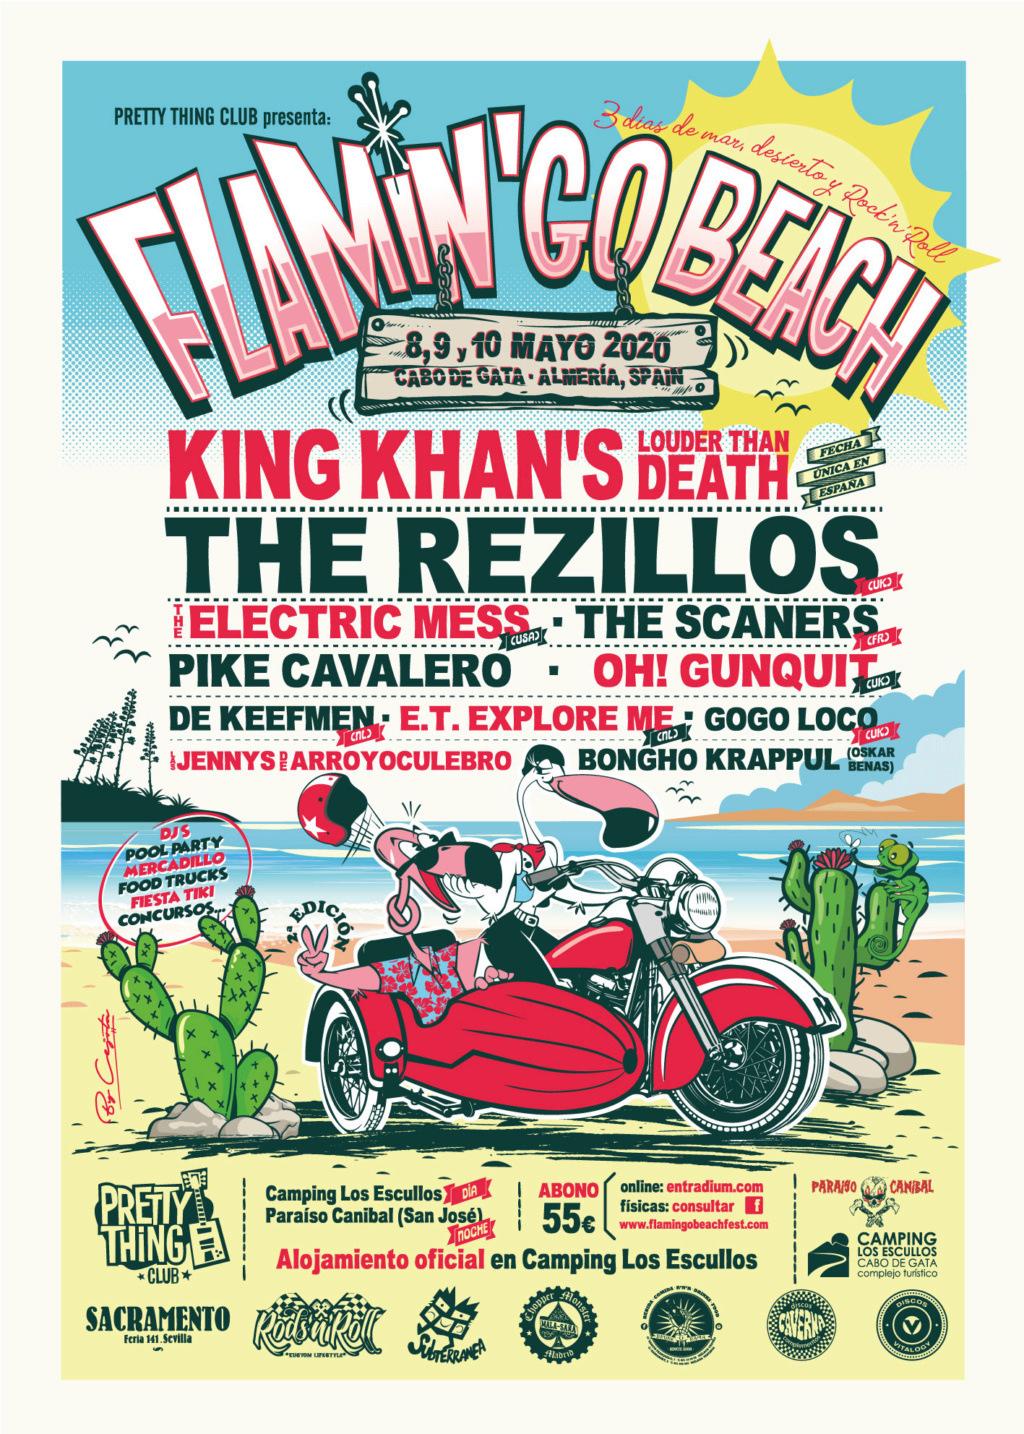 THE REZILLOS y KING KHAN LTD al Flamin'Go Beach! Fest 2020 / Cabo de Gata ¡CARTEL COMPLETO! Cartel10